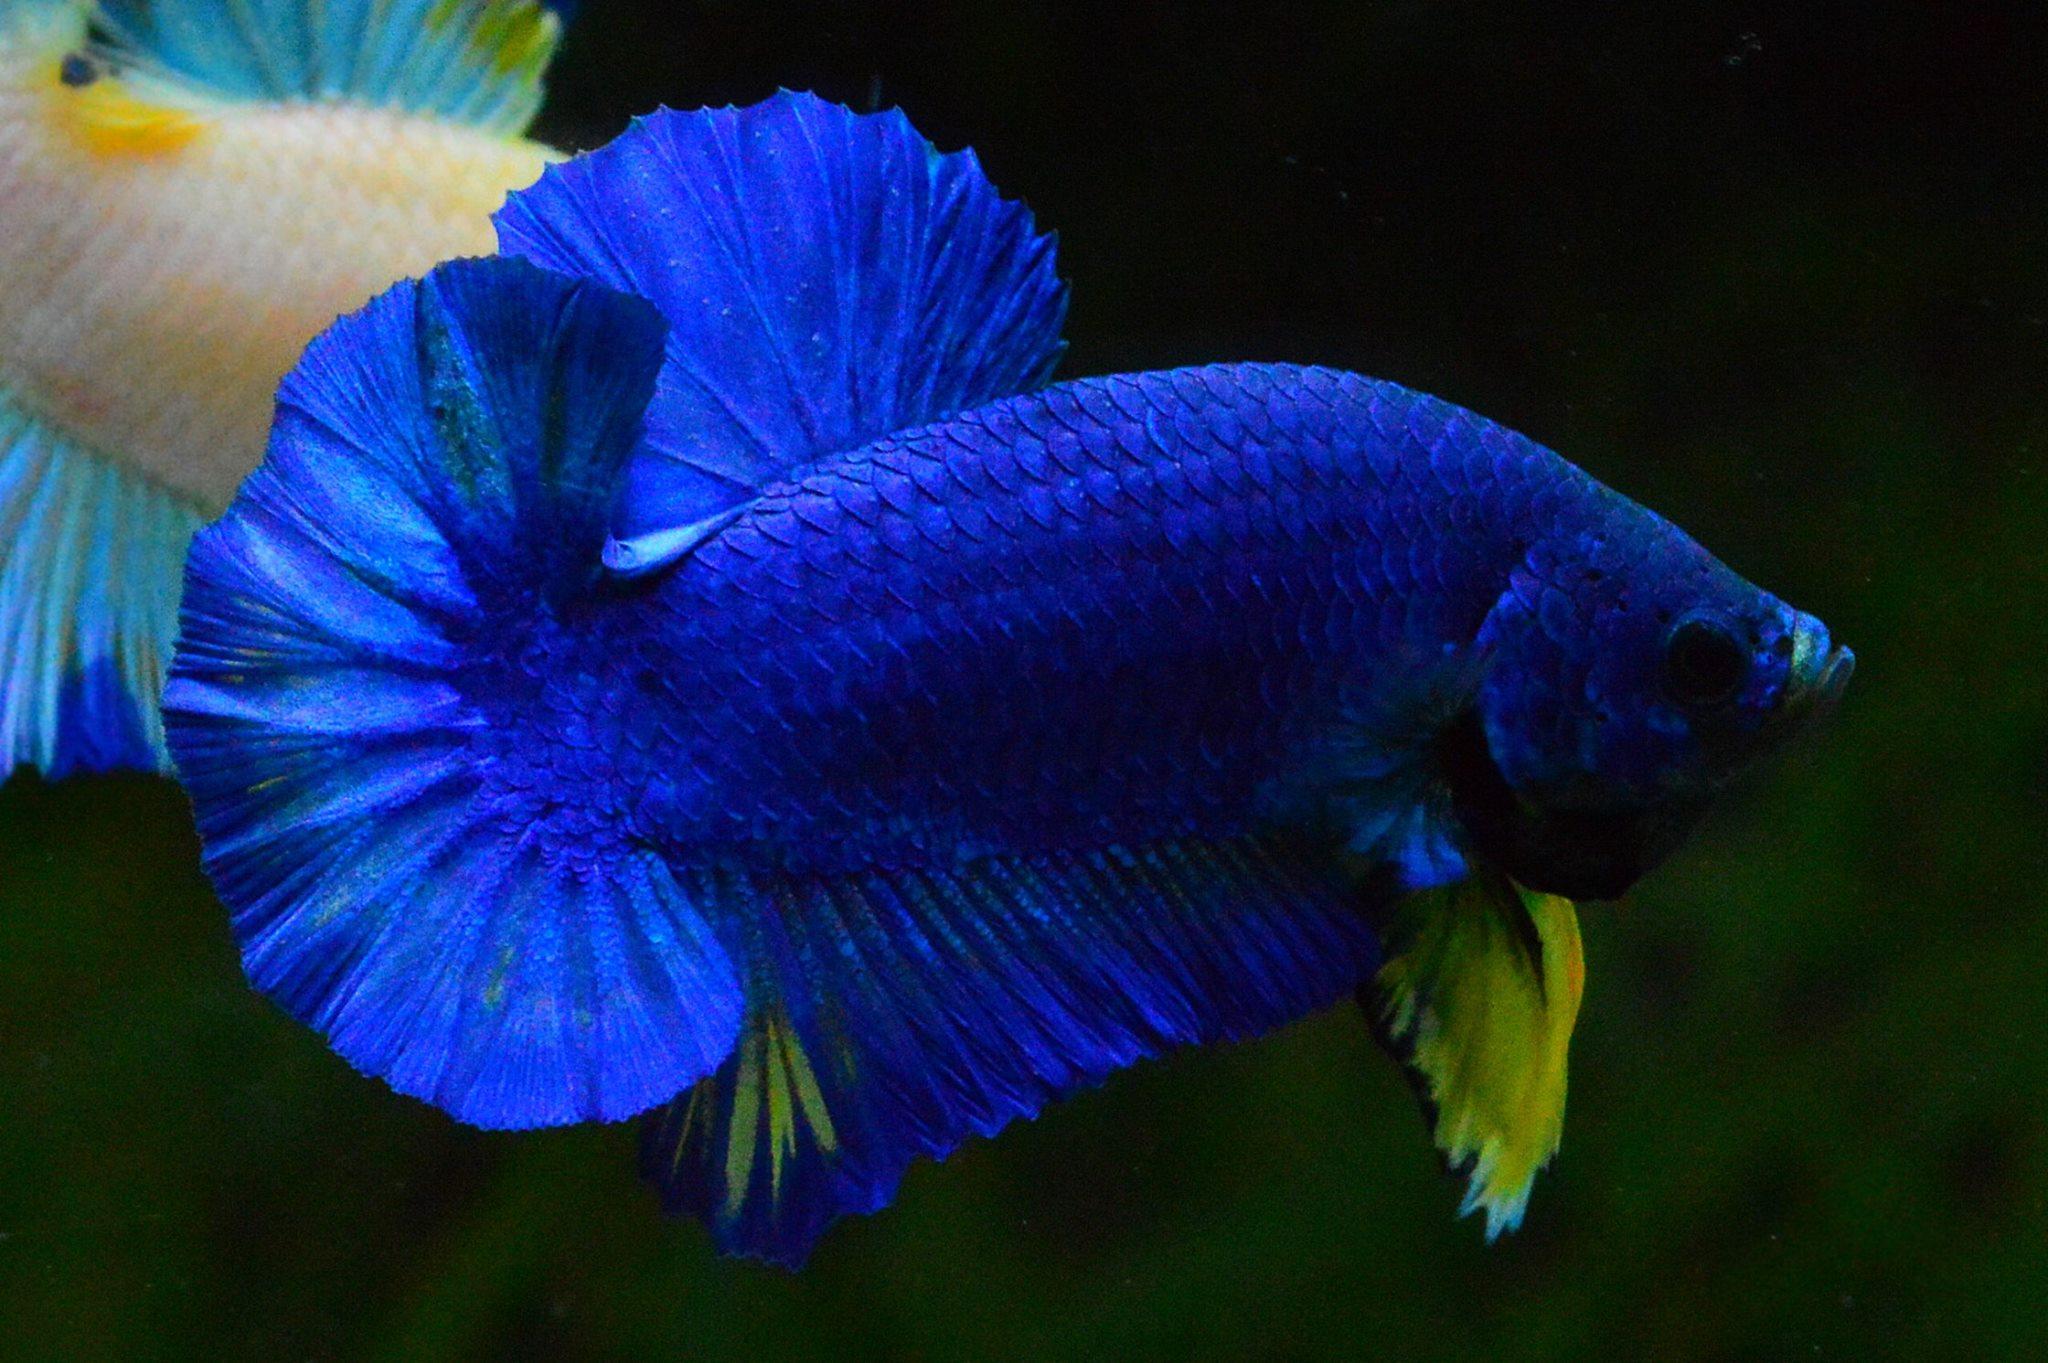 Hi - Premium Grade AAA+ คัดเกรดปลากัดครีบสั้น-Over Tails Halfmoon Plakad Fancy Blue Mustrad